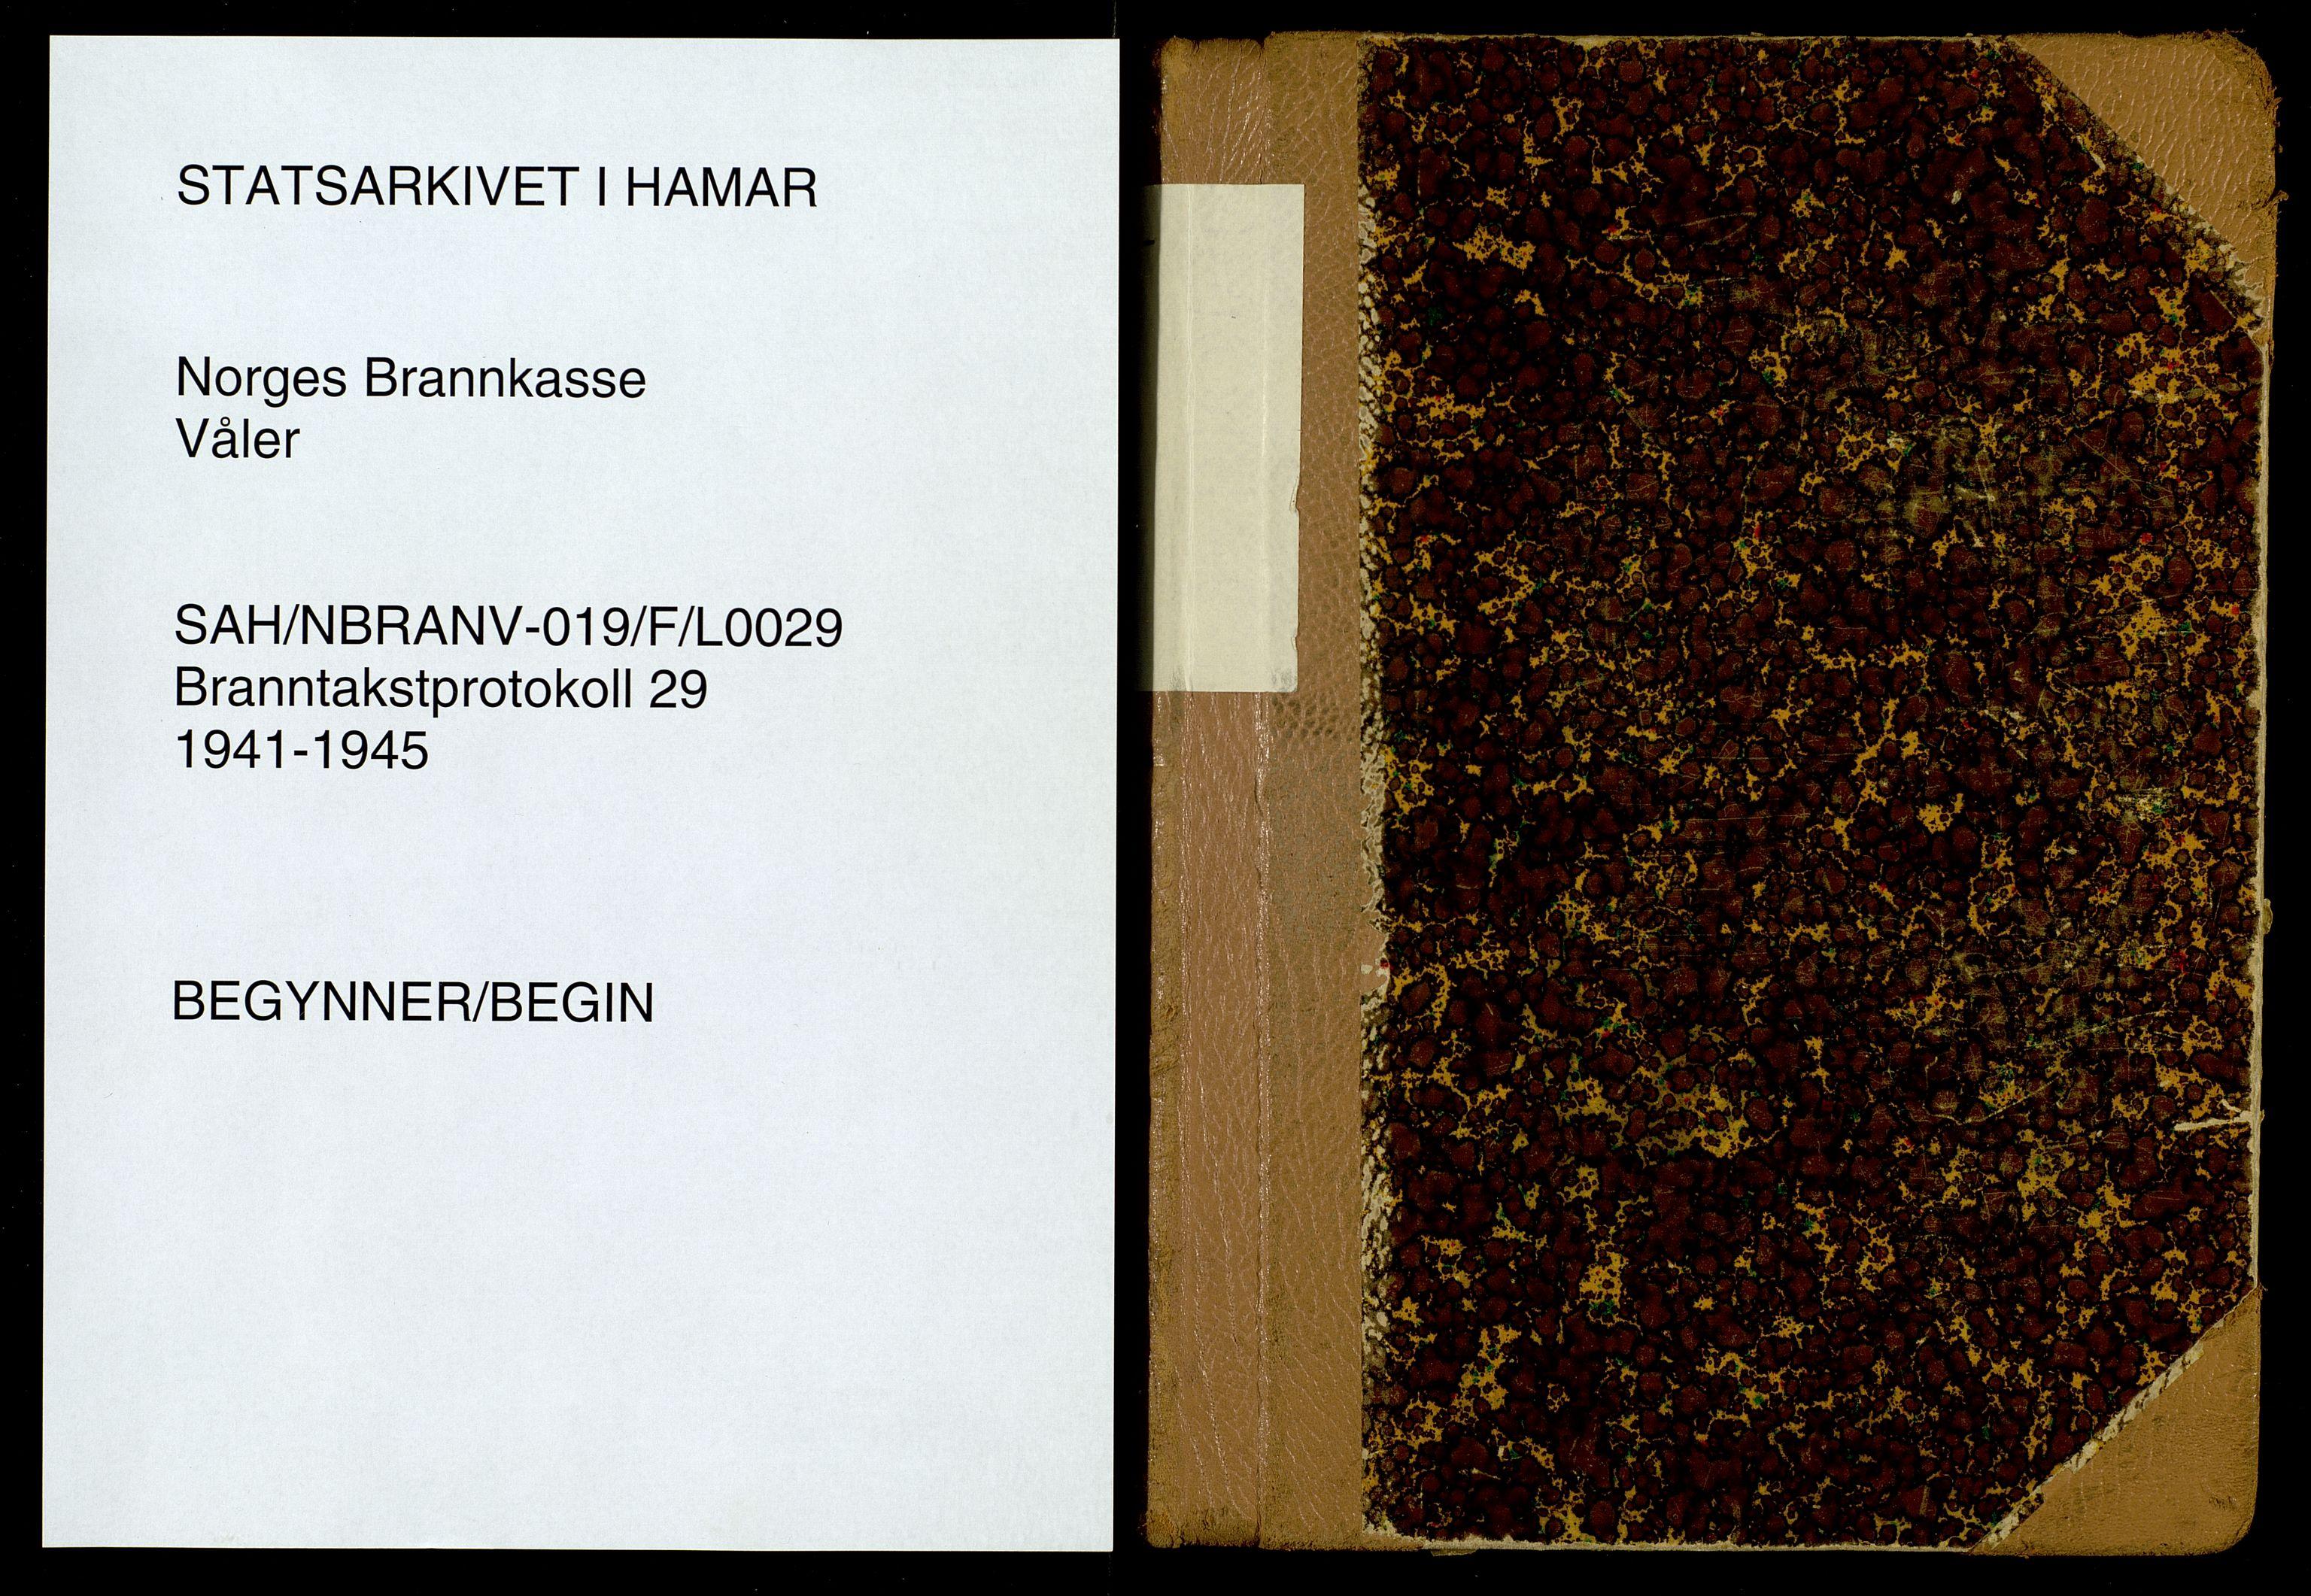 SAH, Norges Brannkasse, Våler, F/L0029: Branntakstprotokoll, 1941-1945